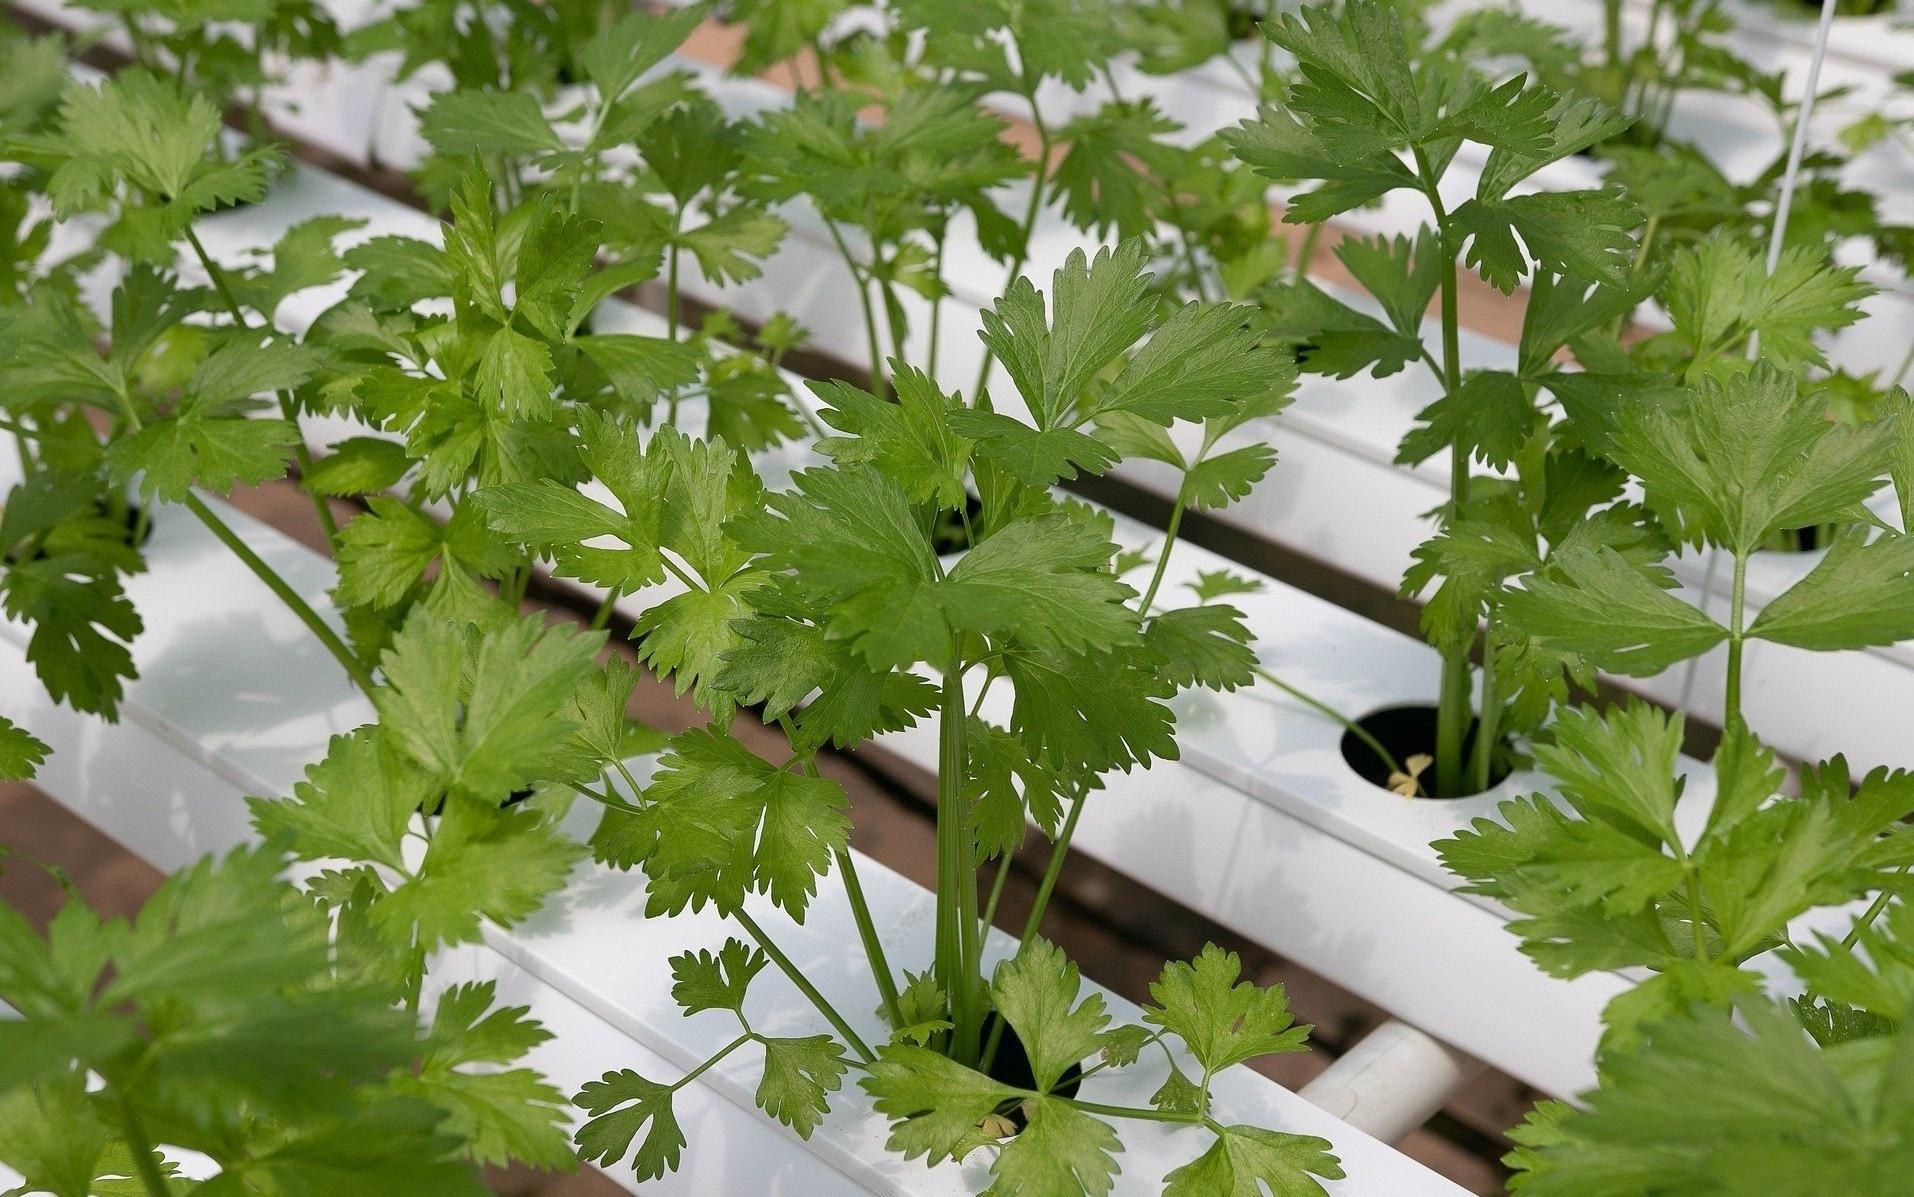 Coriander in 2020 Hydroponics, Growing coriander